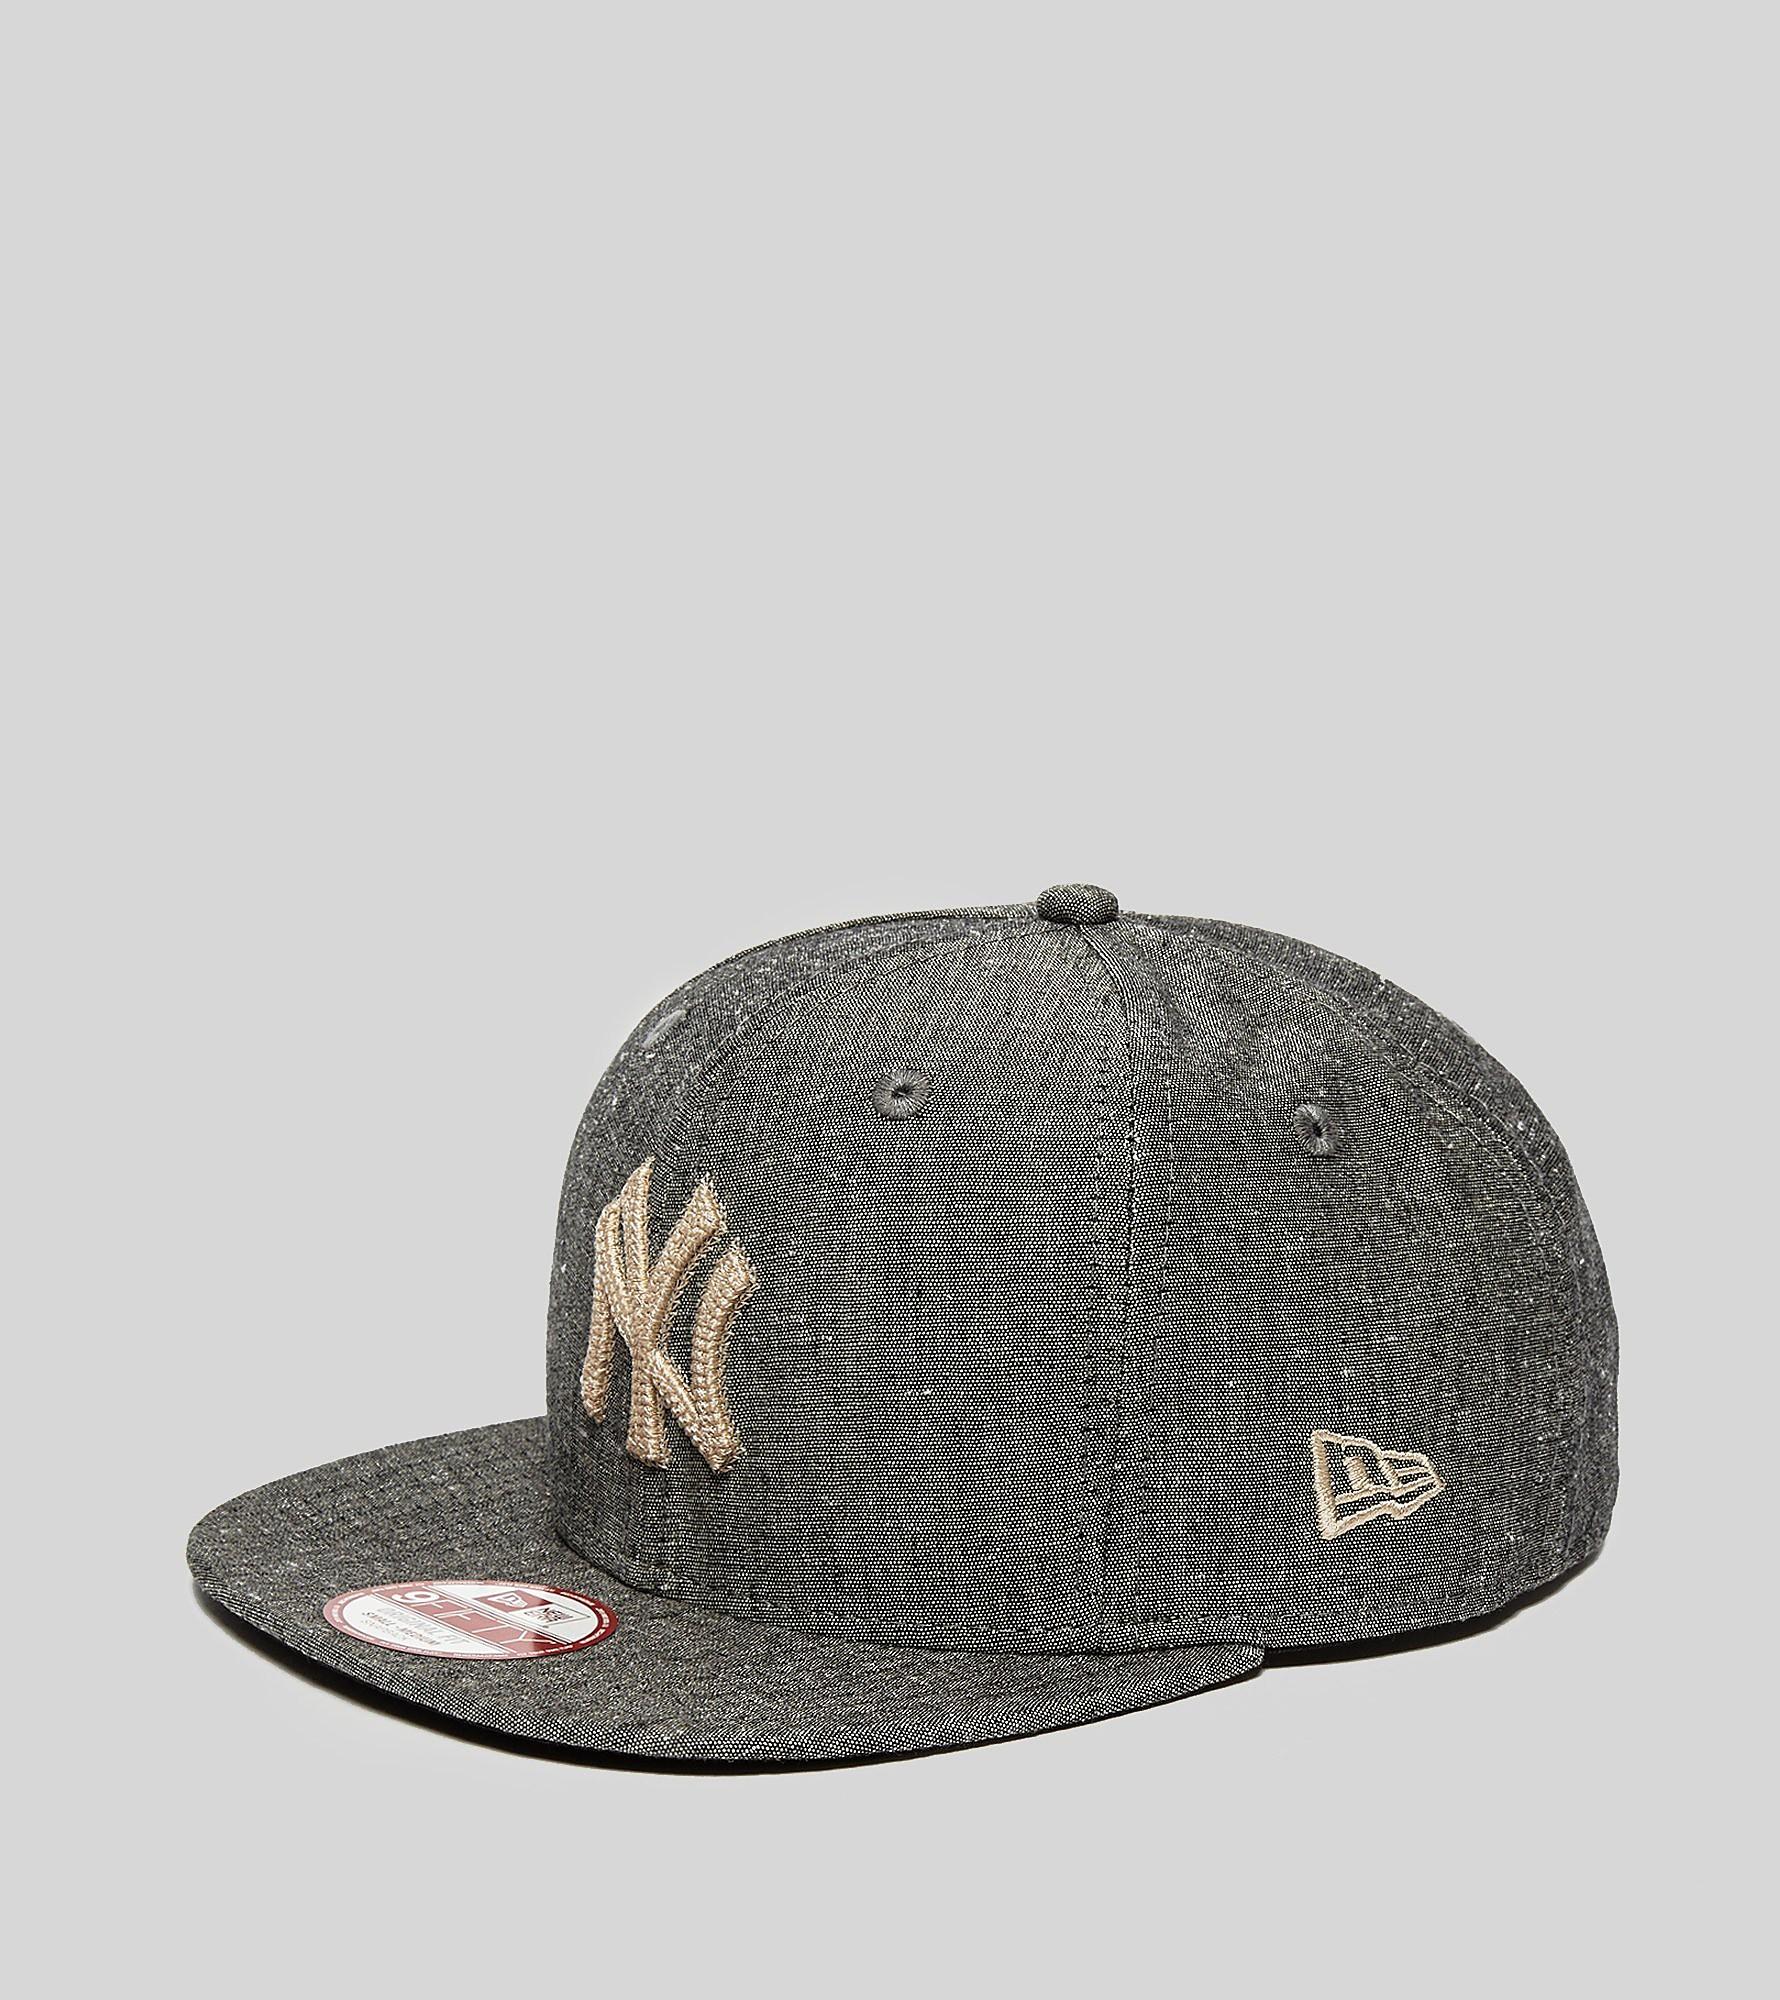 New Era 9FIFTY NY Yankees Snapback Cap - size? Exclusive